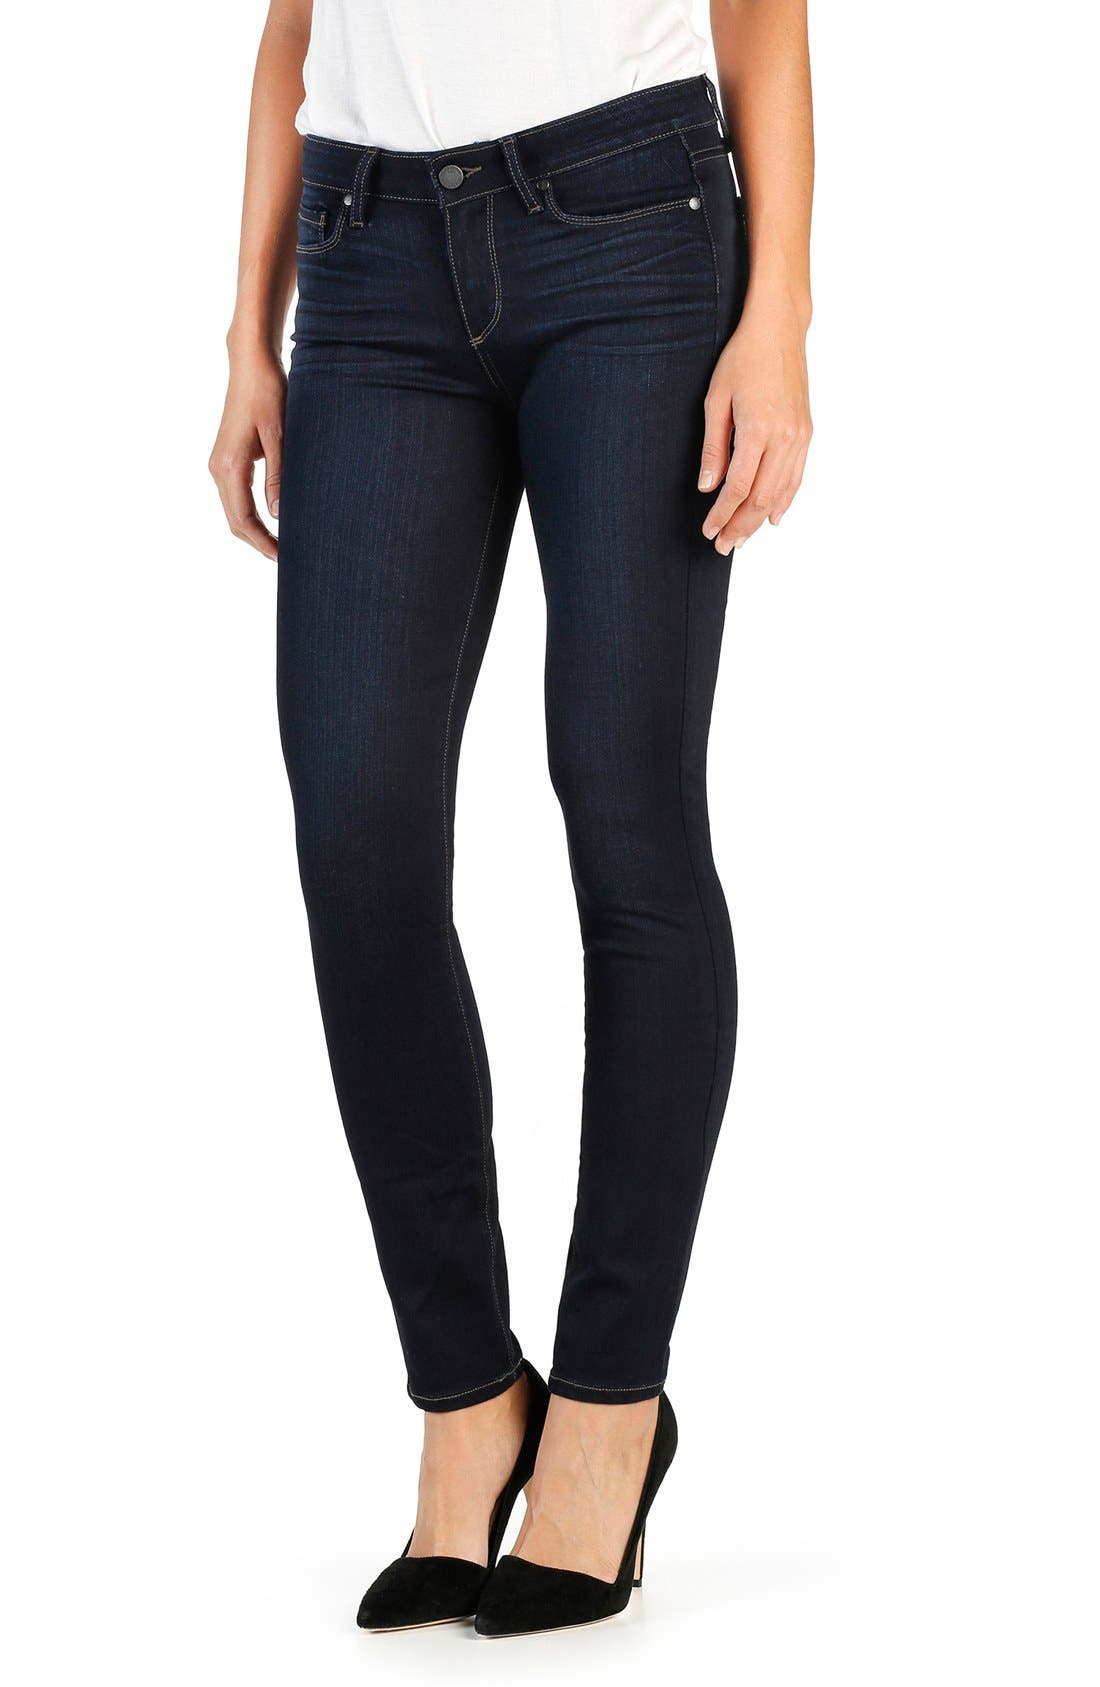 Transcend Verdugo Ankle Ultra Skinny Jeans,                             Alternate thumbnail 4, color,                             ELLORA